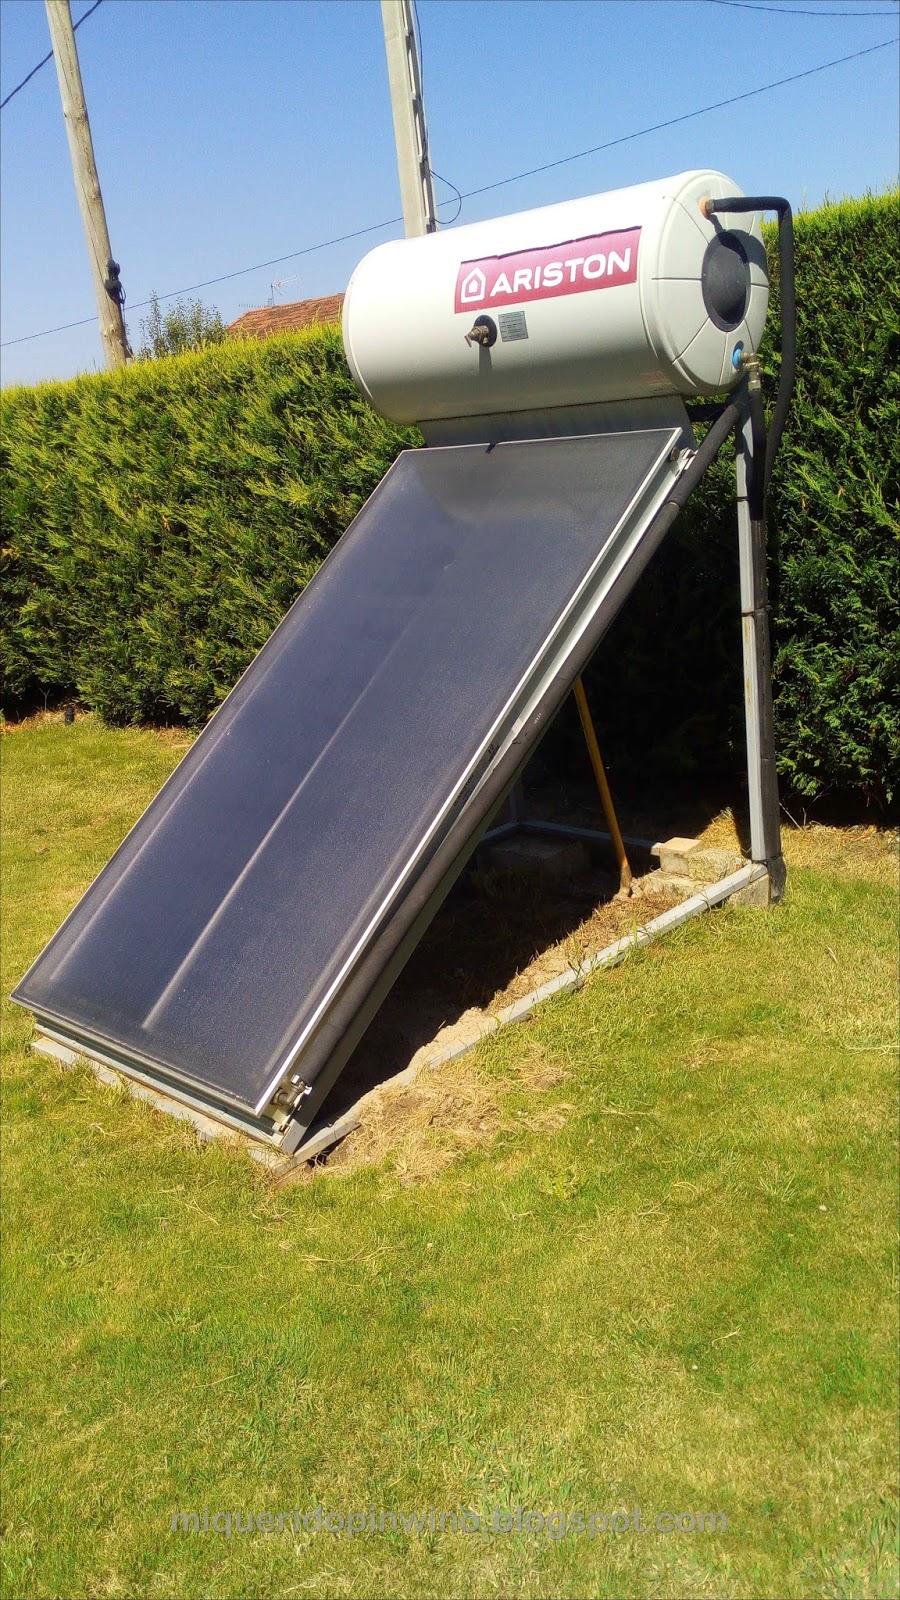 Tecnolog a para un progreso sostenible configuraci n de for Placas solares para calentar agua